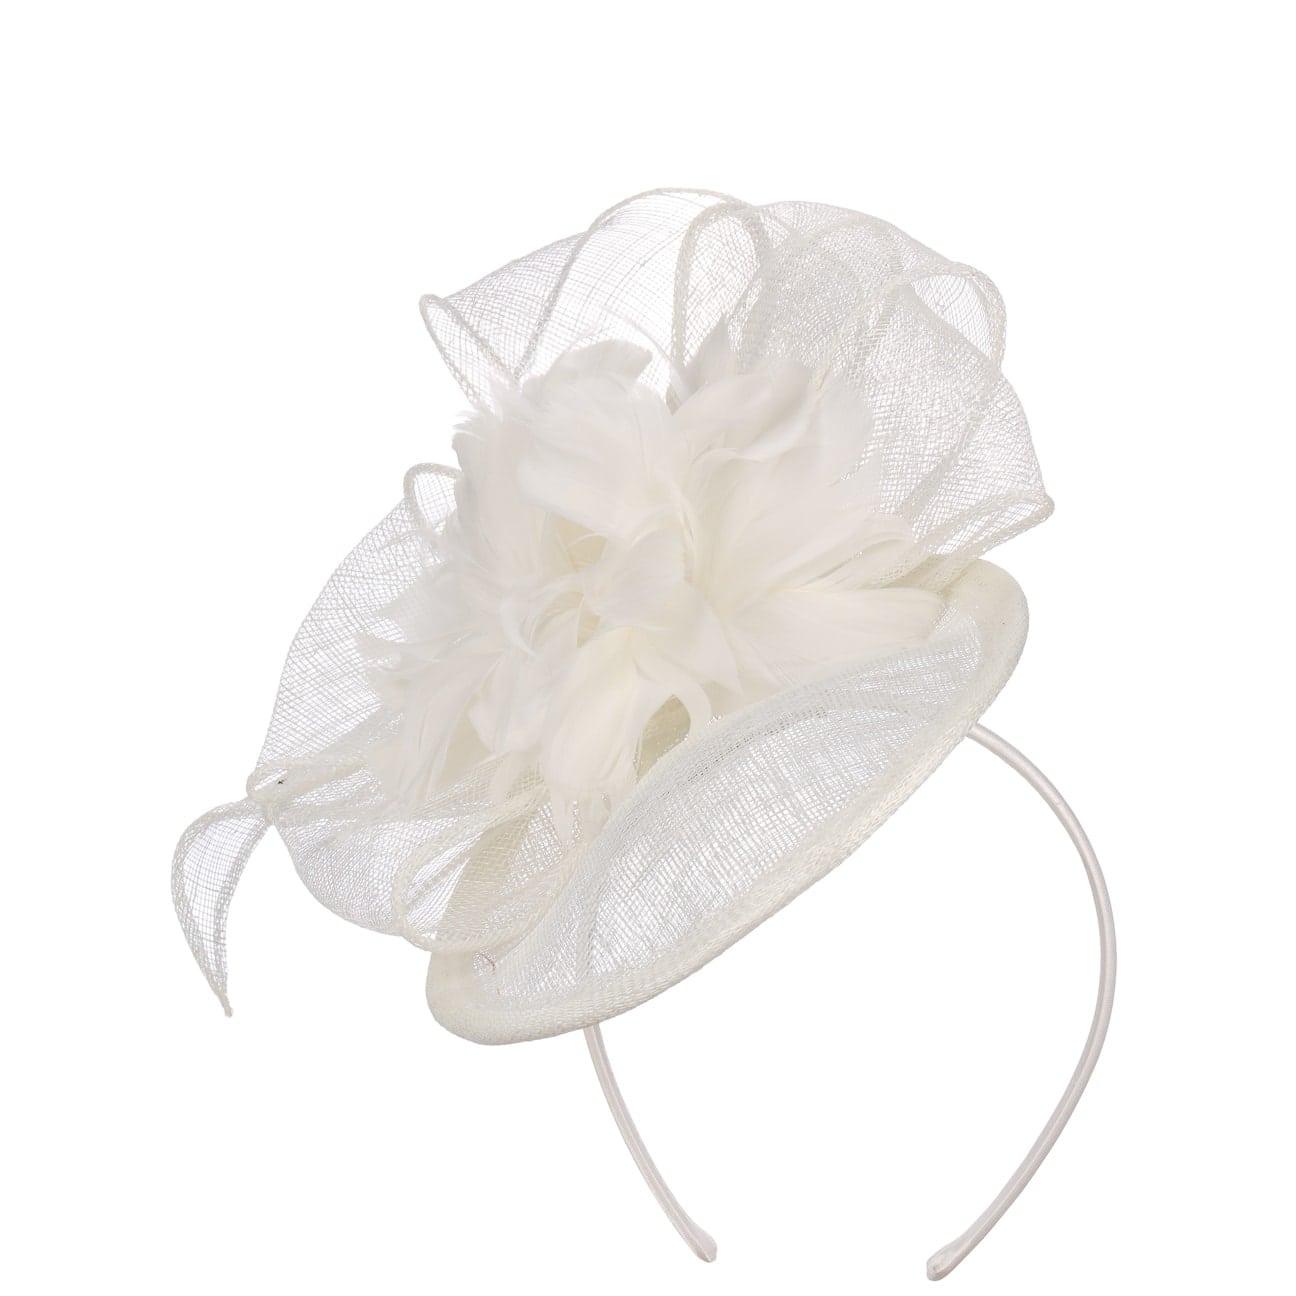 Tocado Pimp Up by Maja Prinzessin von Hohenzollern  sombrero de boda